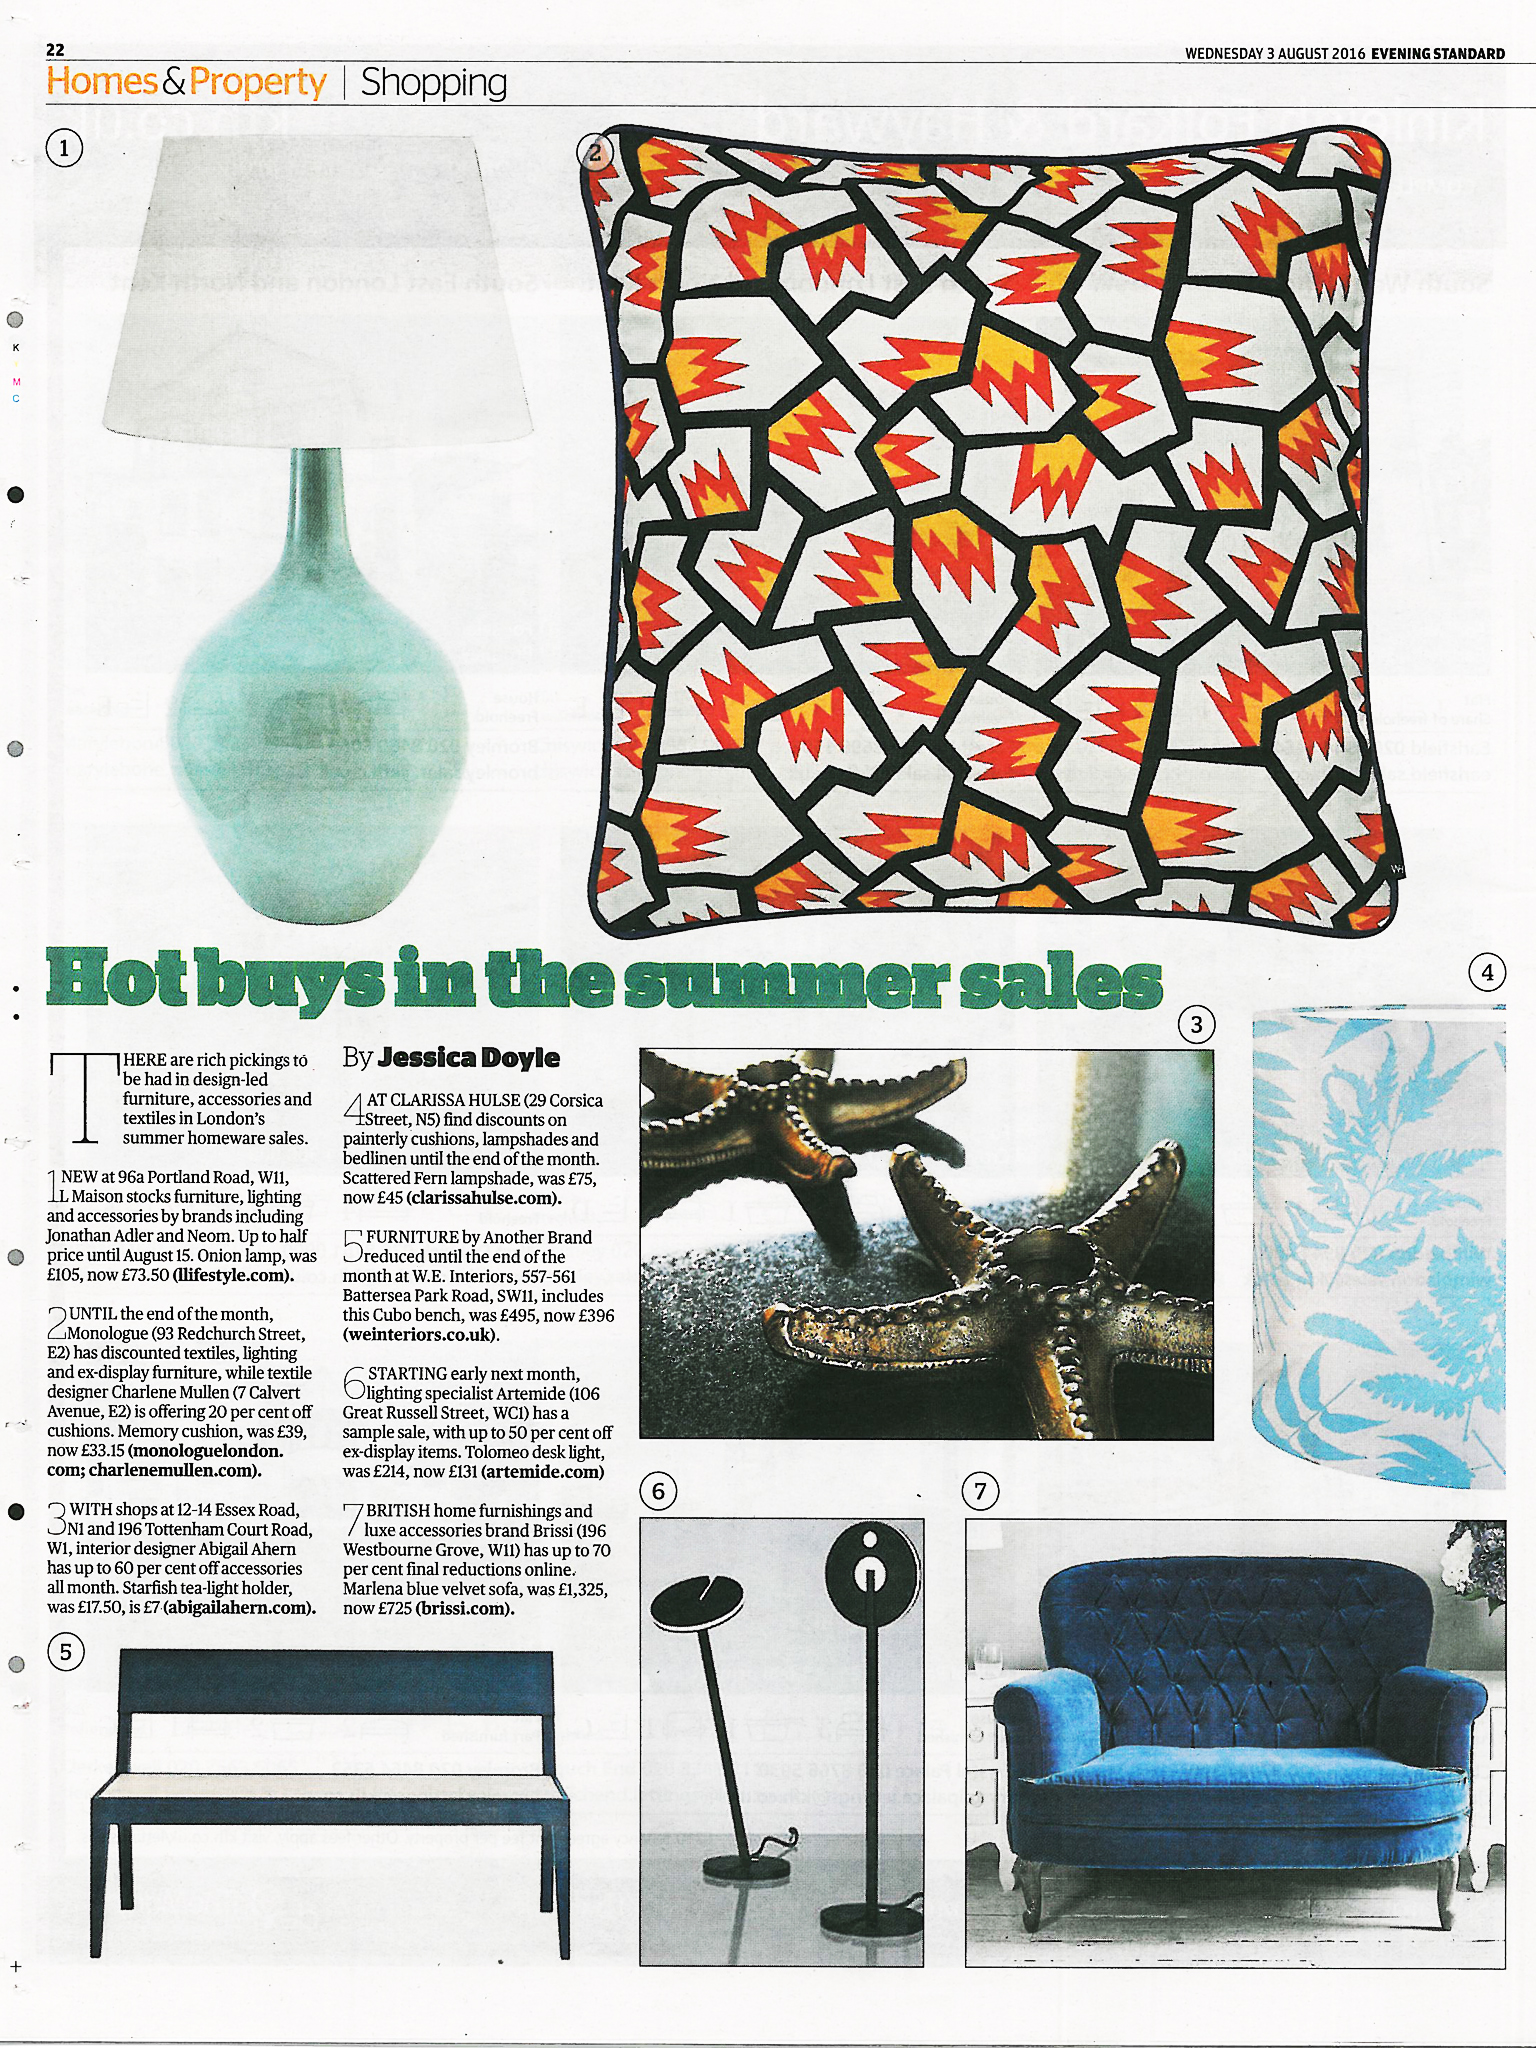 London Evening Standard - Aug 16